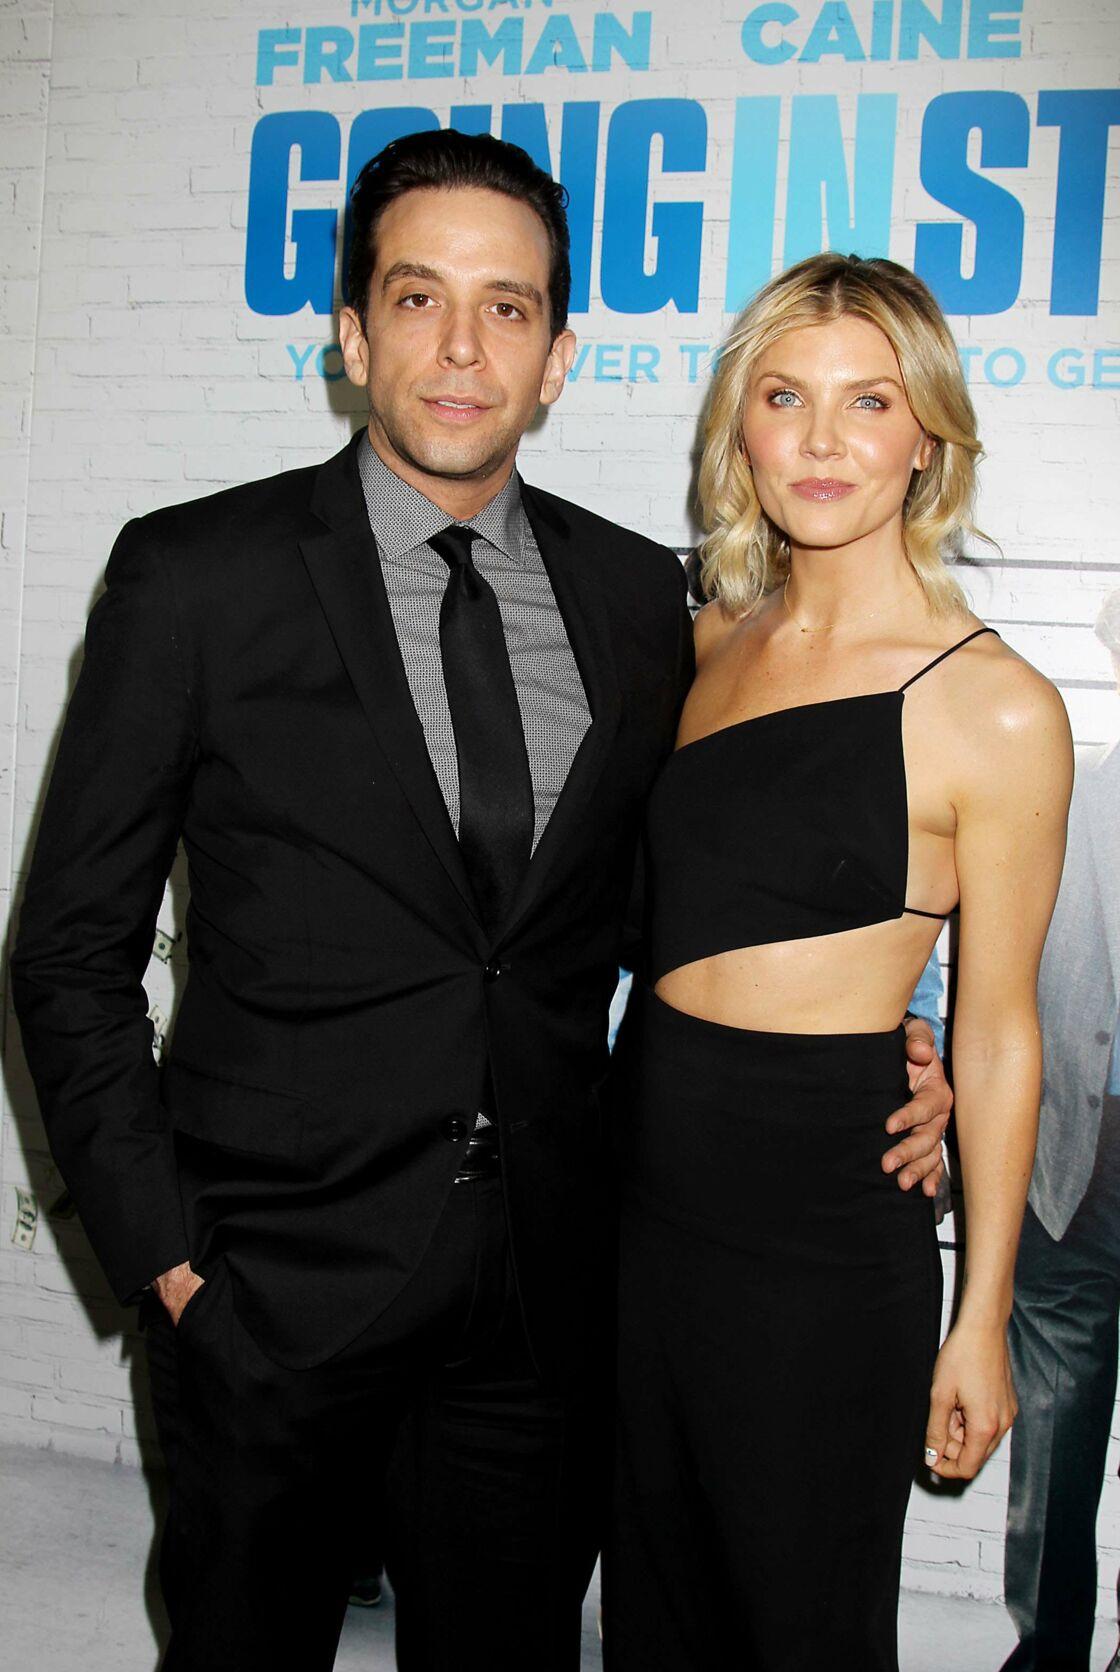 Nick Cordero et son épouse, Amanda Kloots